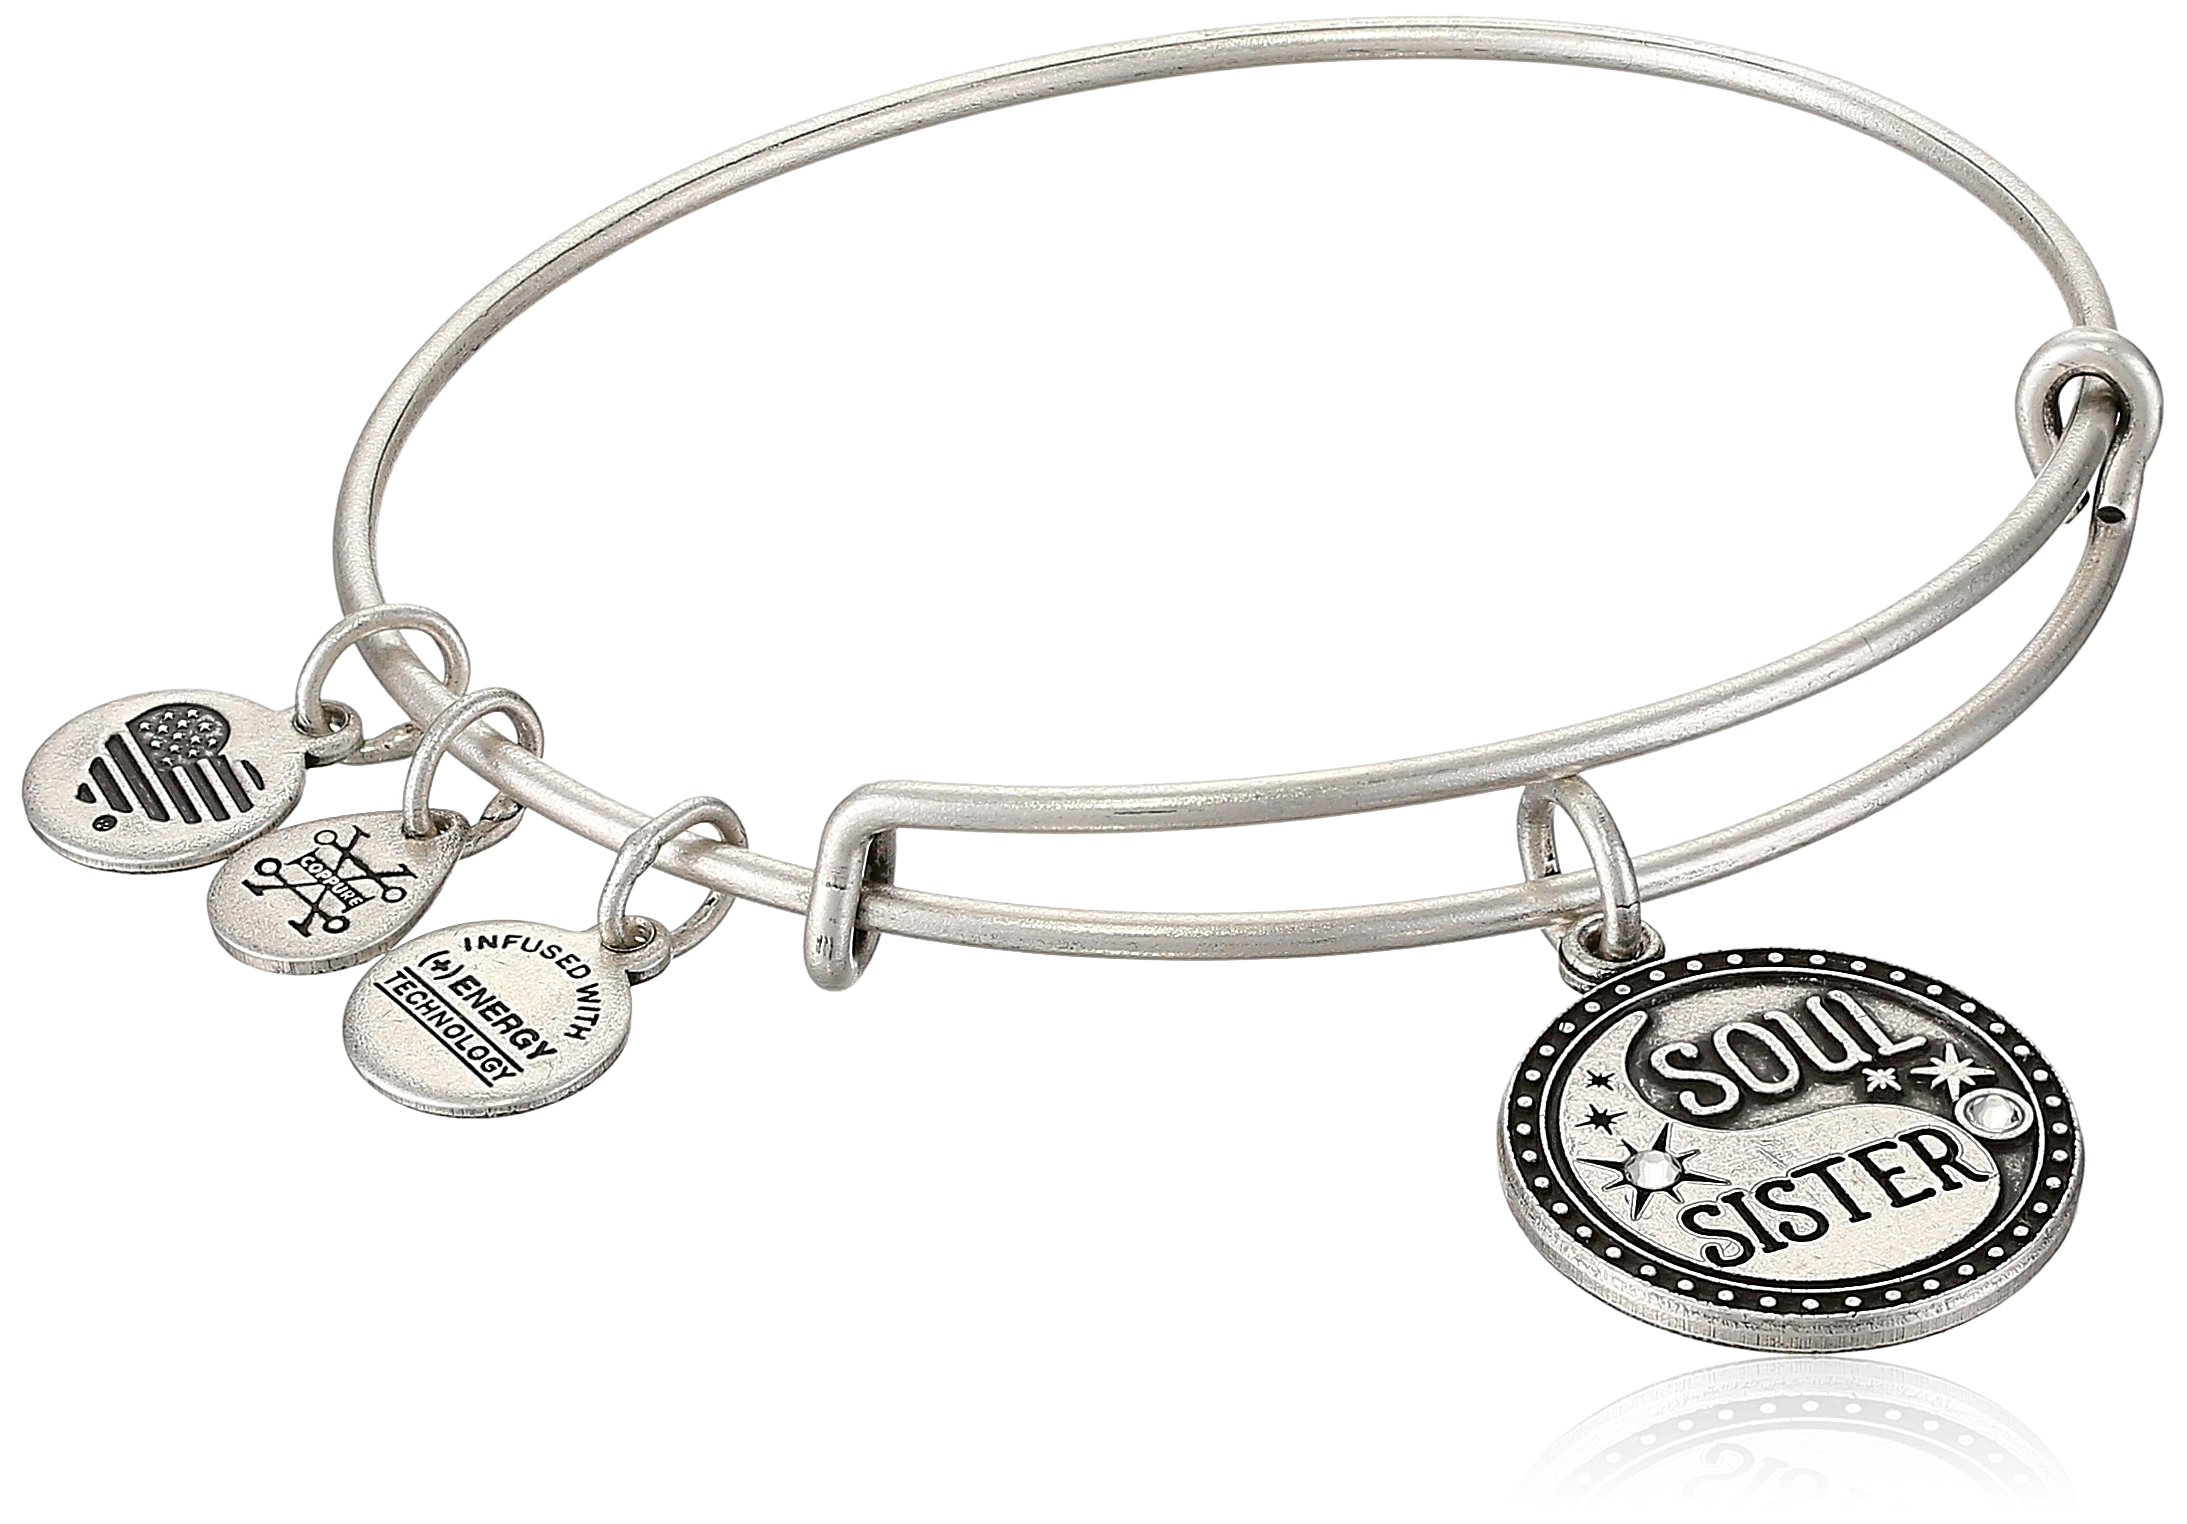 Alex and Ani Womens Soul Sister EWB Bangle Bracelet, Rafaelian Silver, Expandable by Alex and Ani